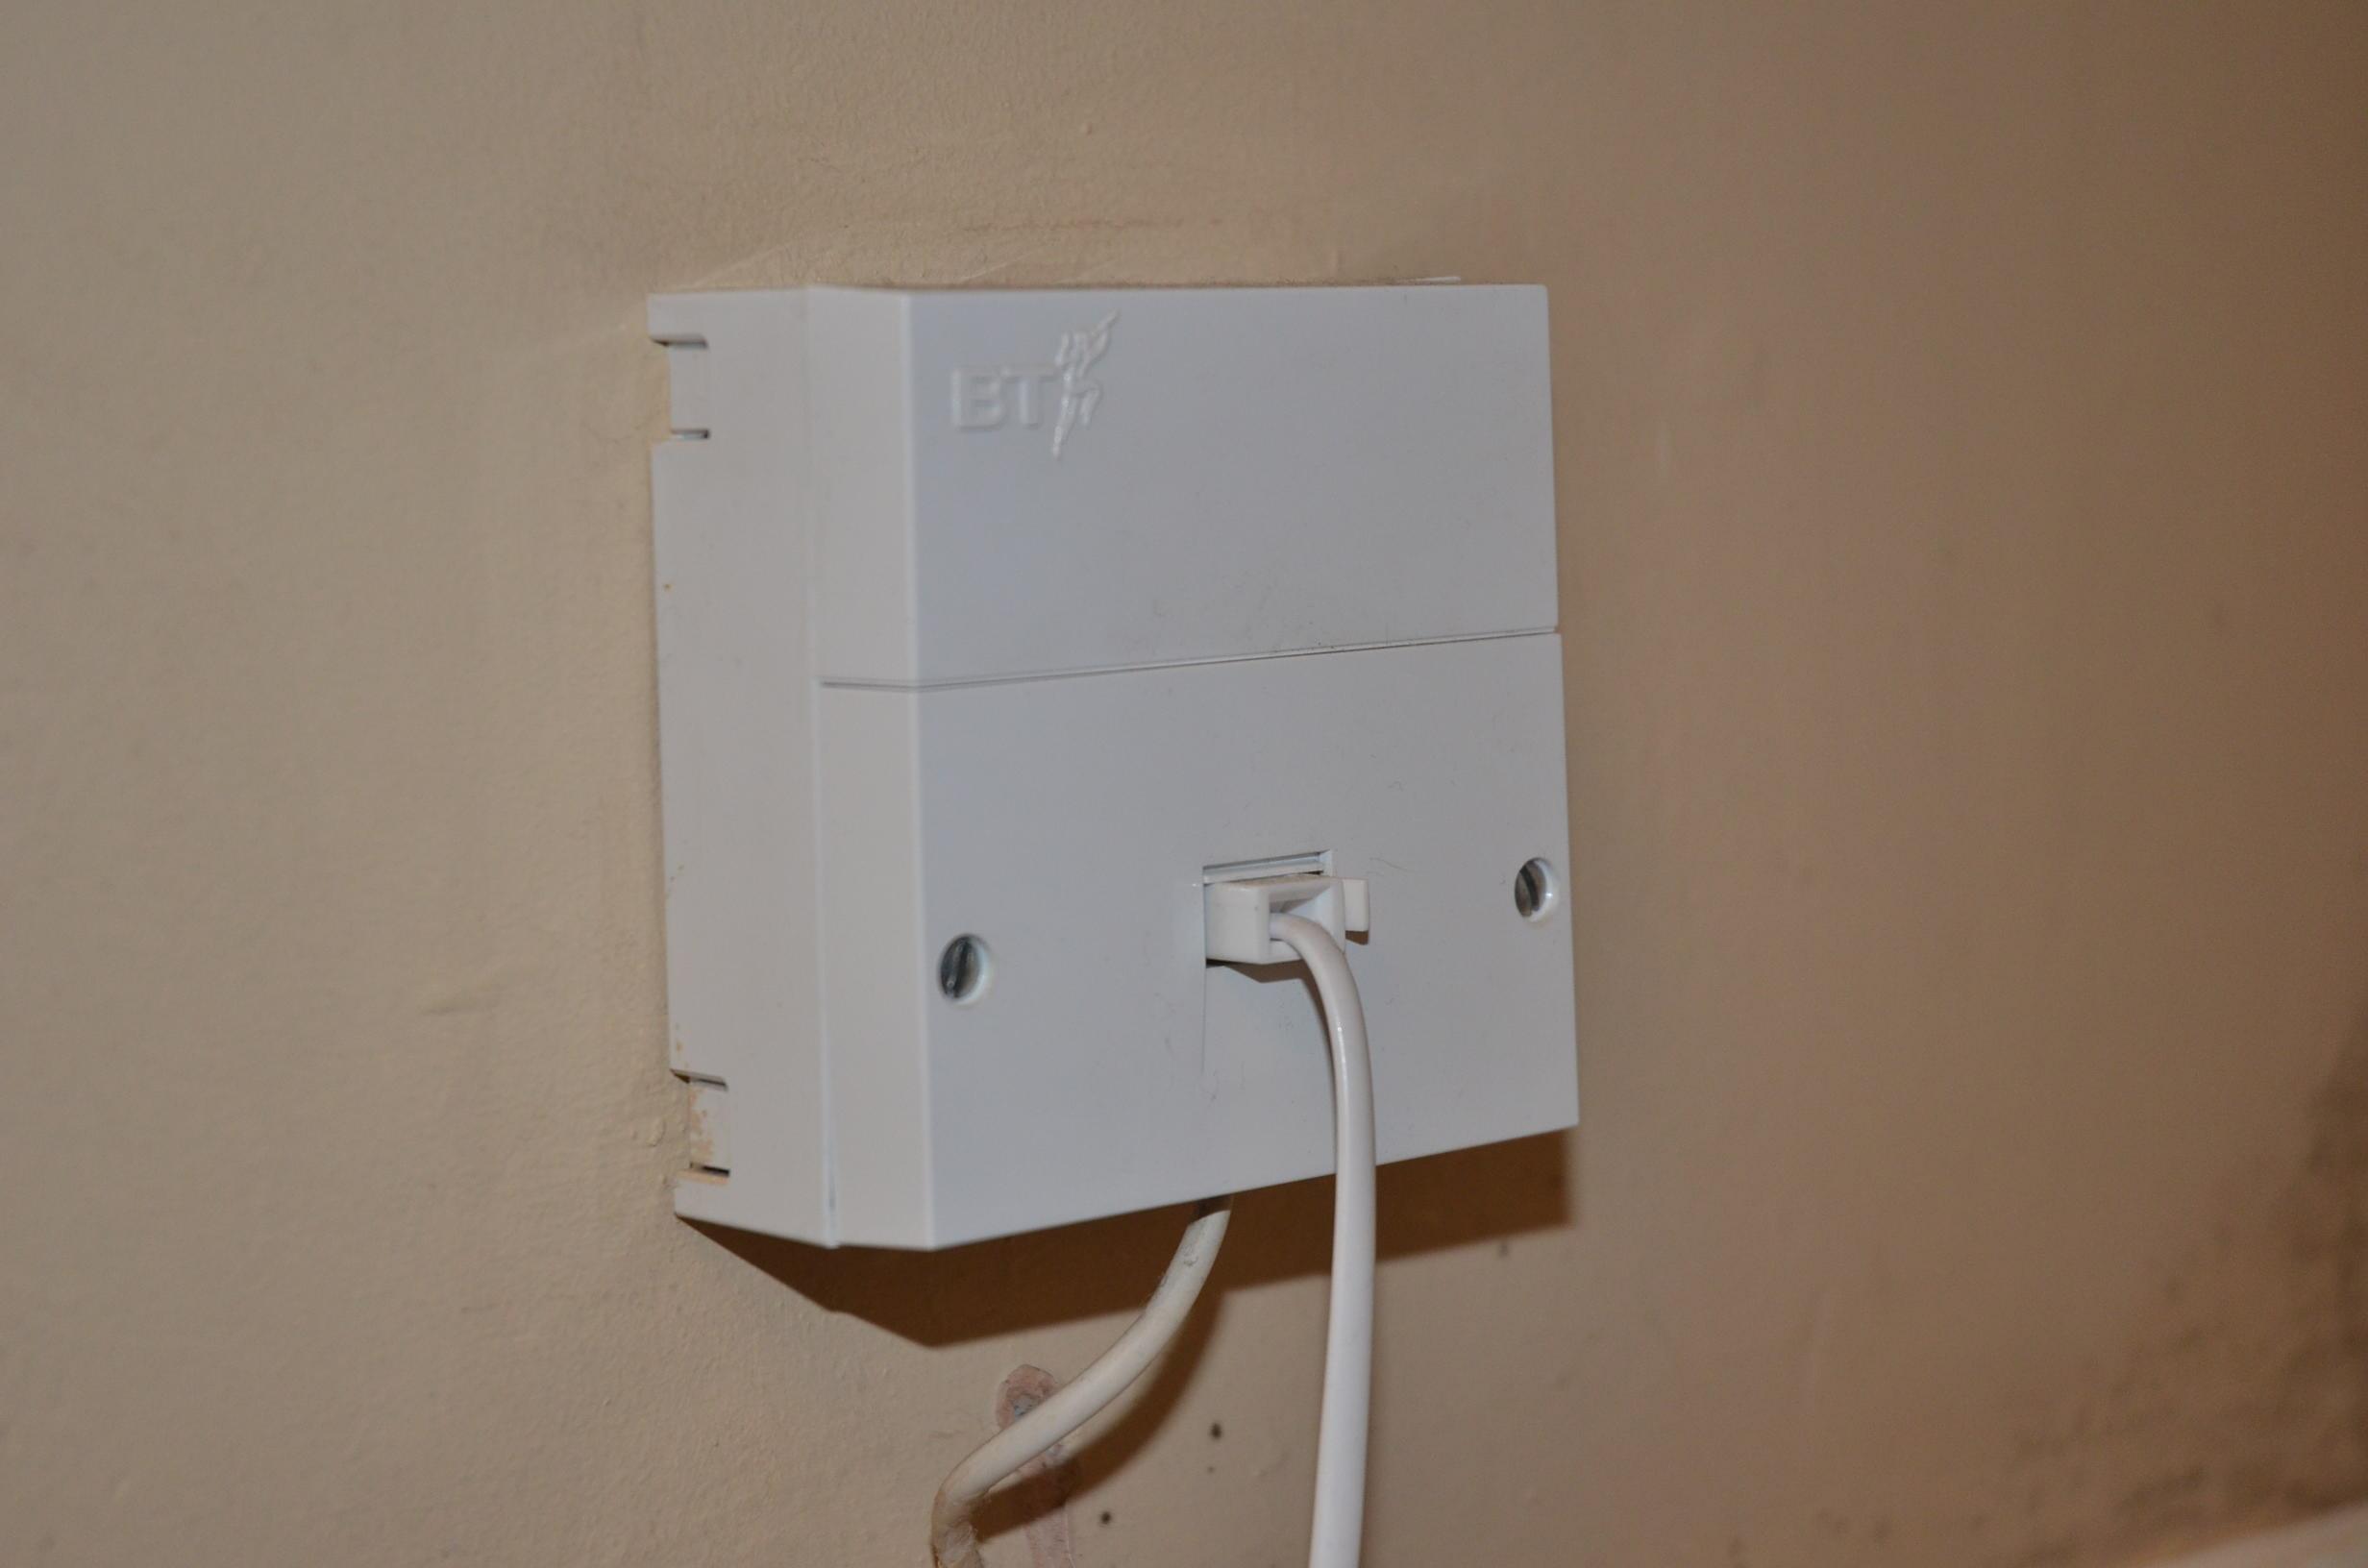 Master socket problems!!